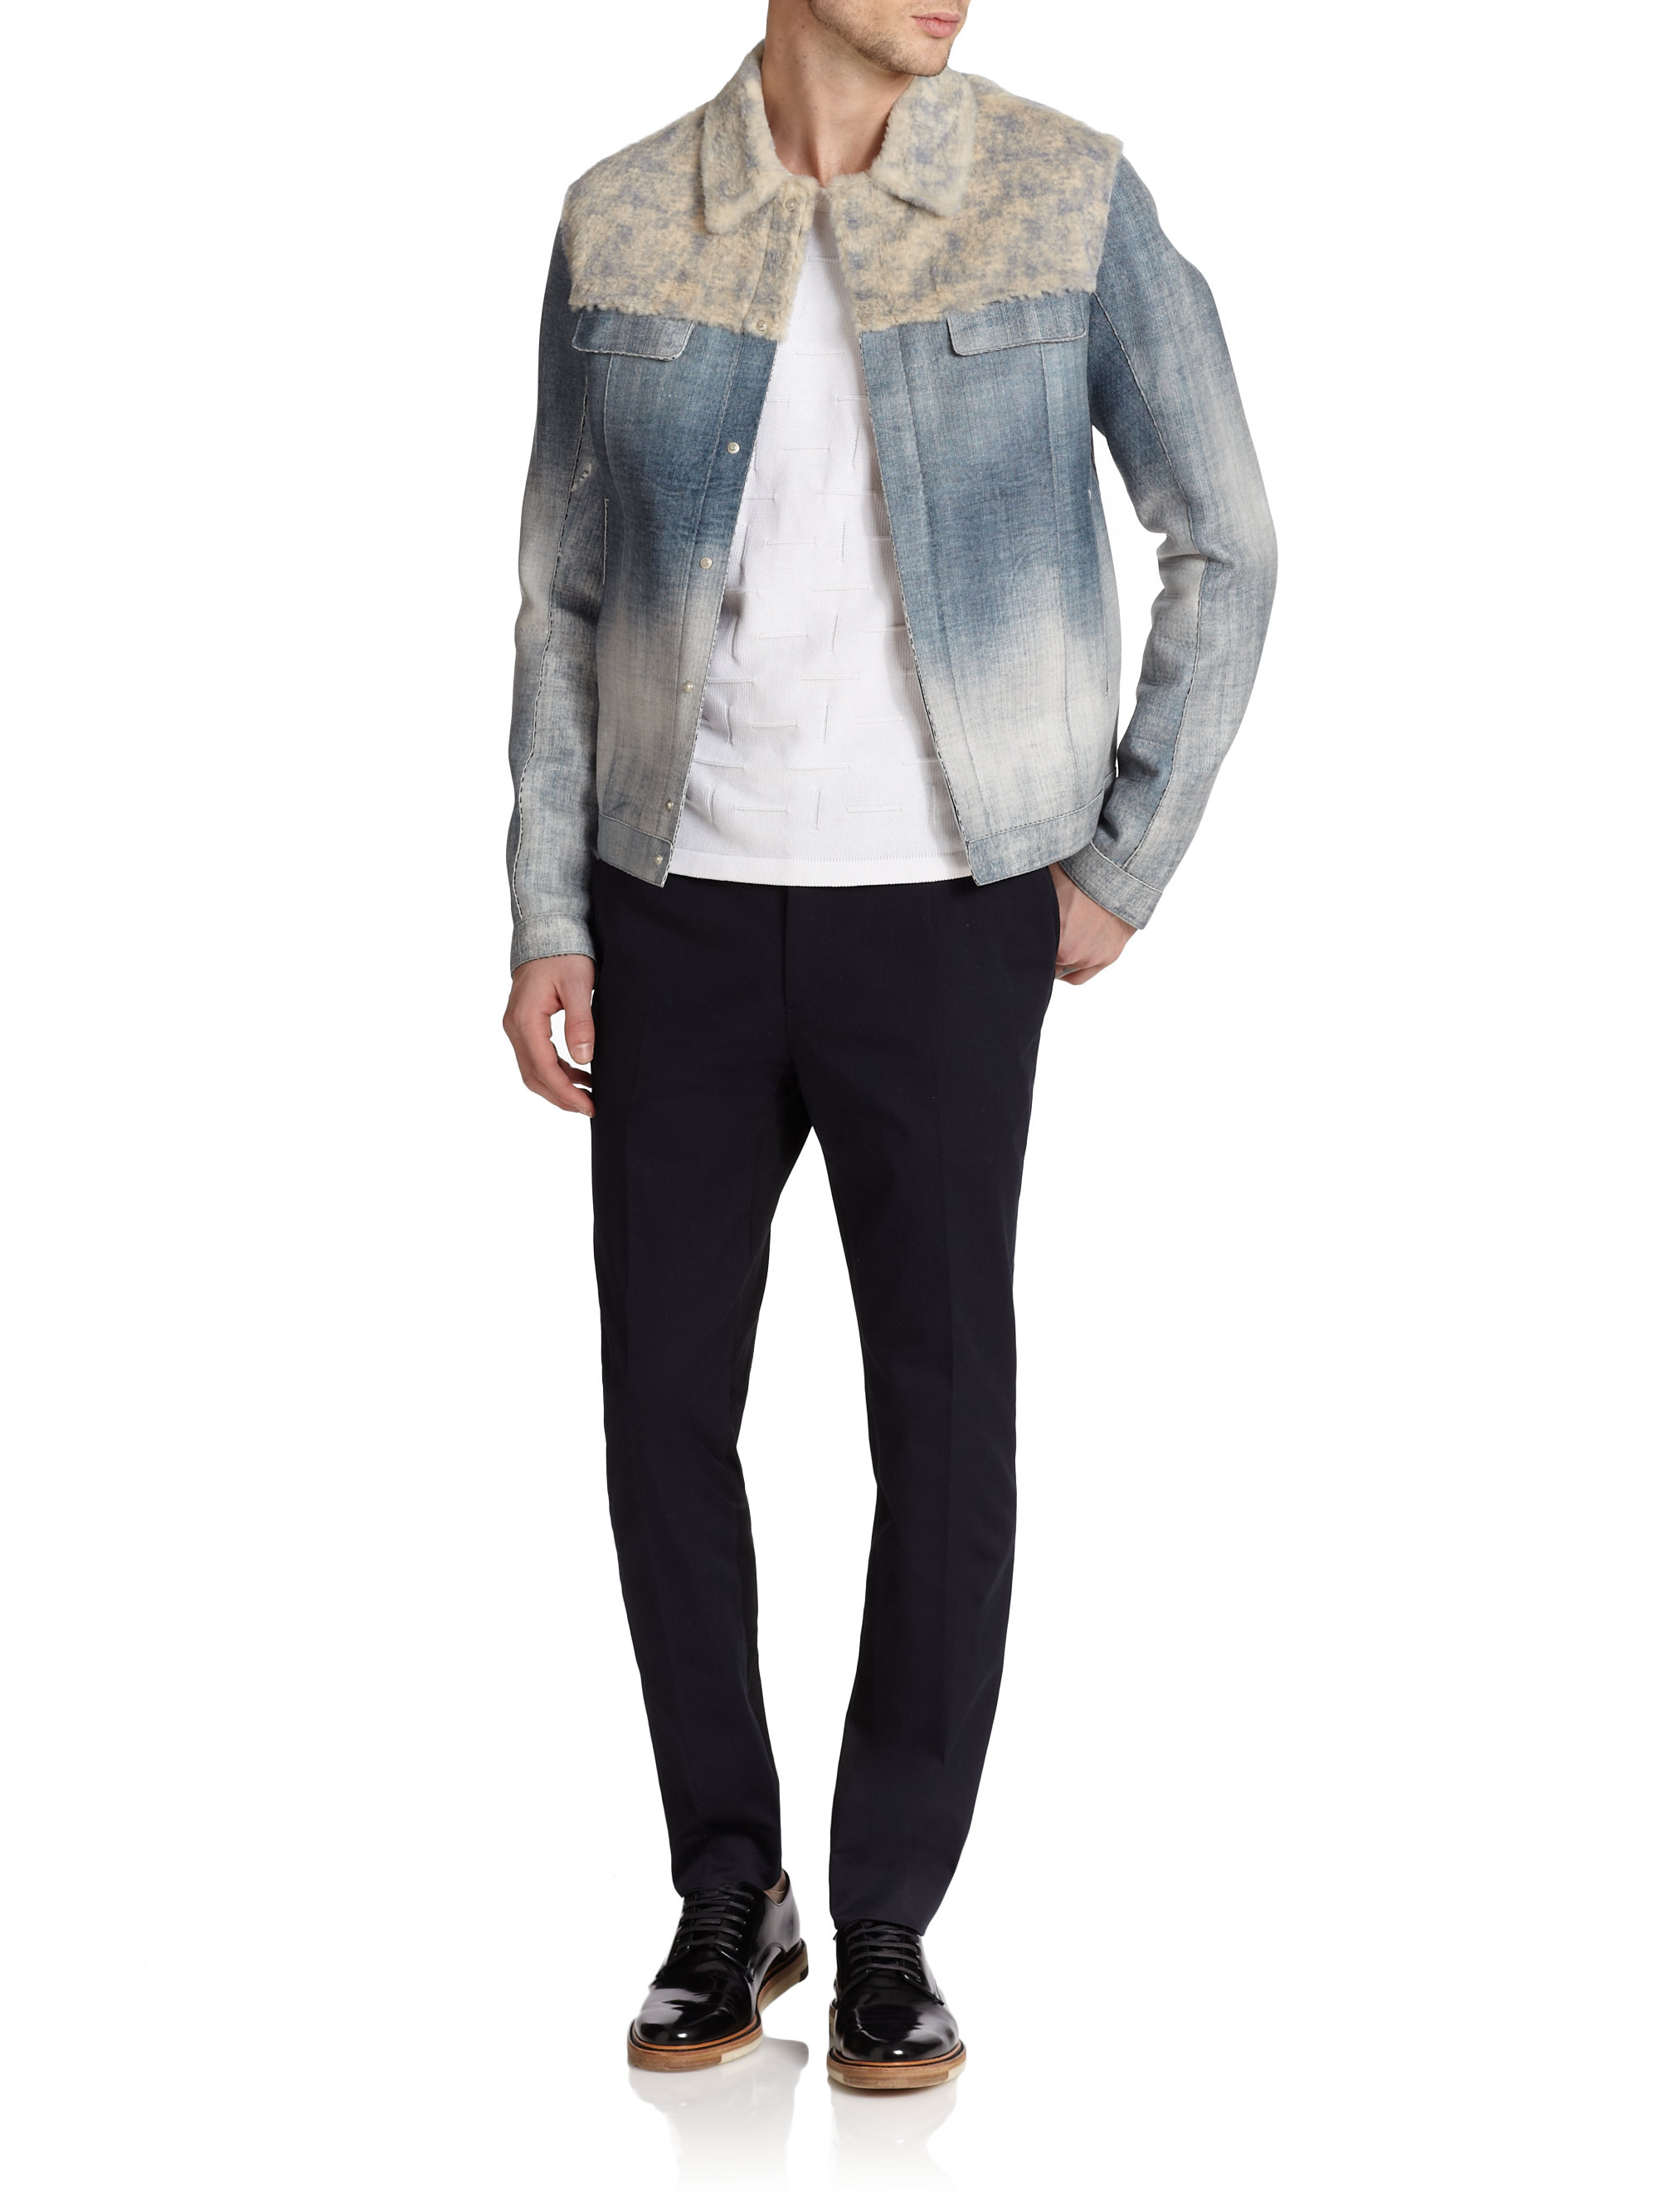 Fendi Rabbit Fur  Denim-Print Leather Jacket In Blue For